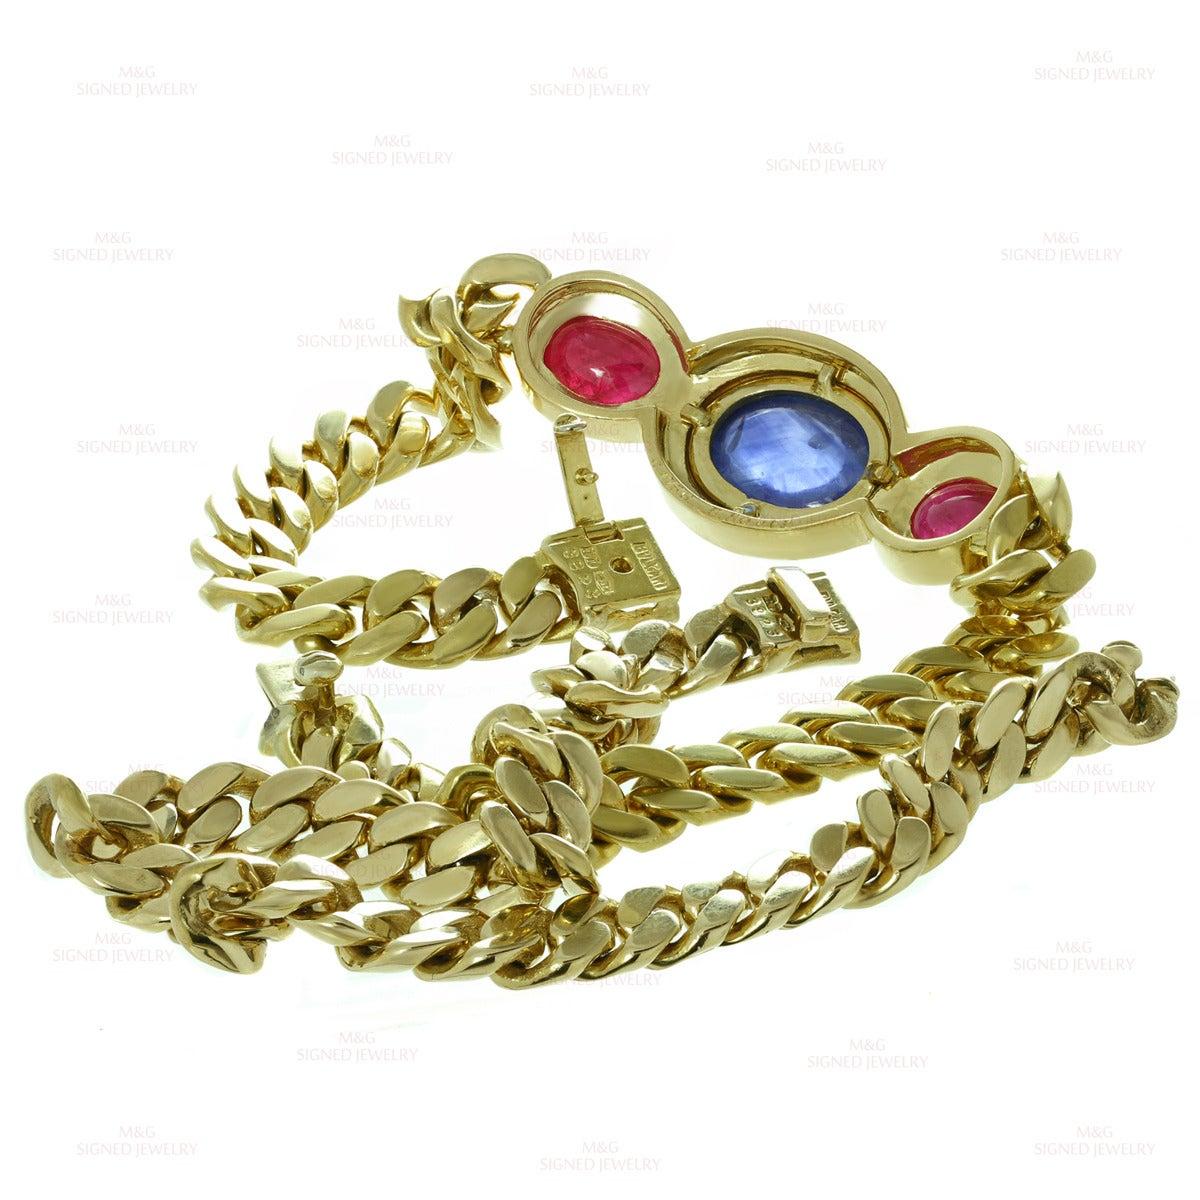 1980s Bulgari Classic Sapphire Ruby Gold Link Interchangeable Bracelet Necklace 8